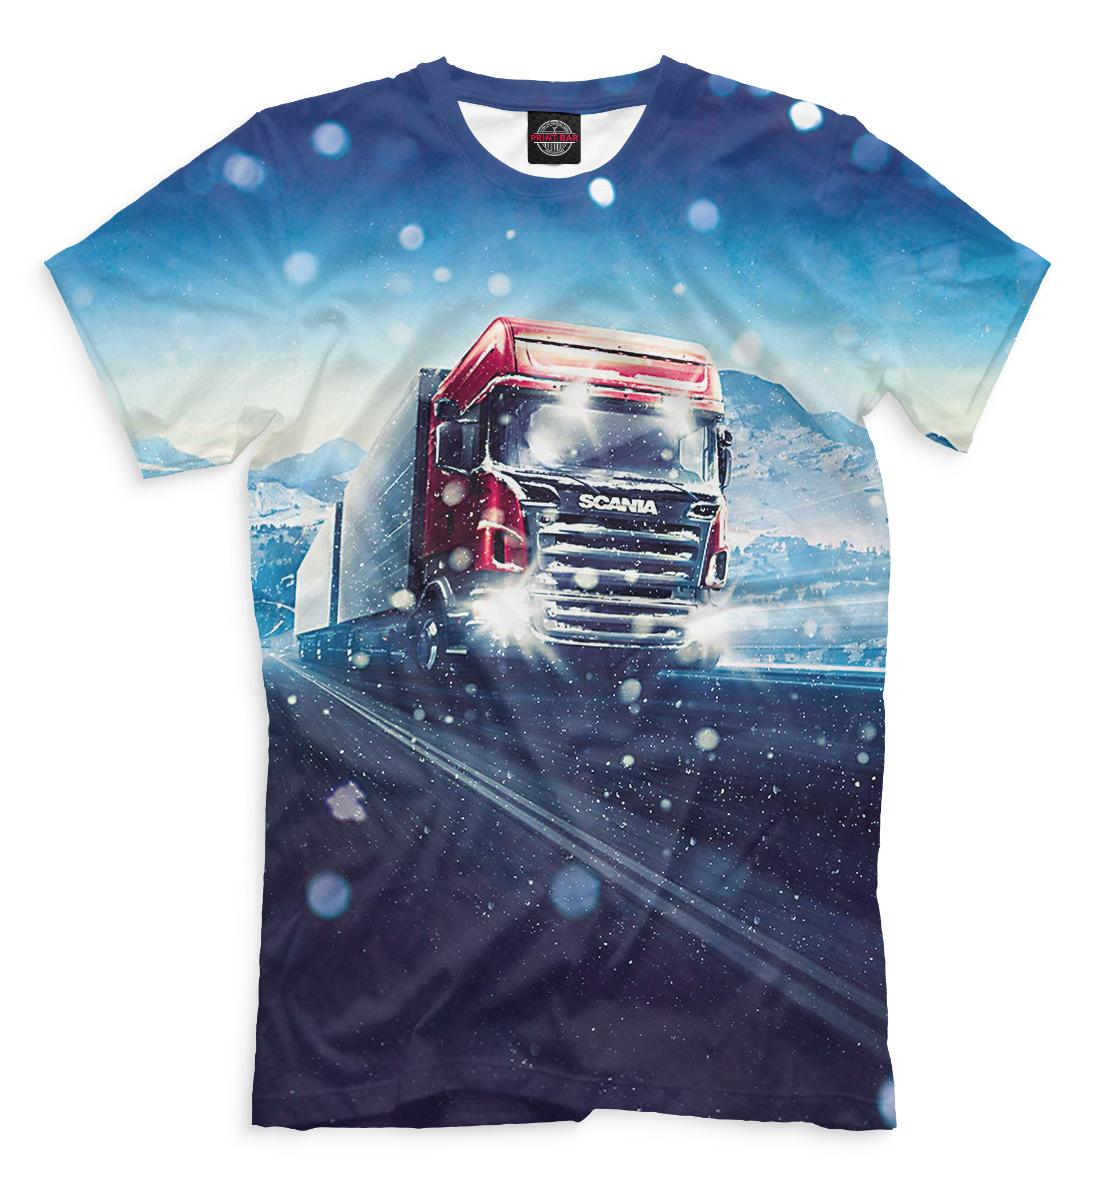 Купить Scania, Printbar, Футболки, GRZ-587036-fut-2